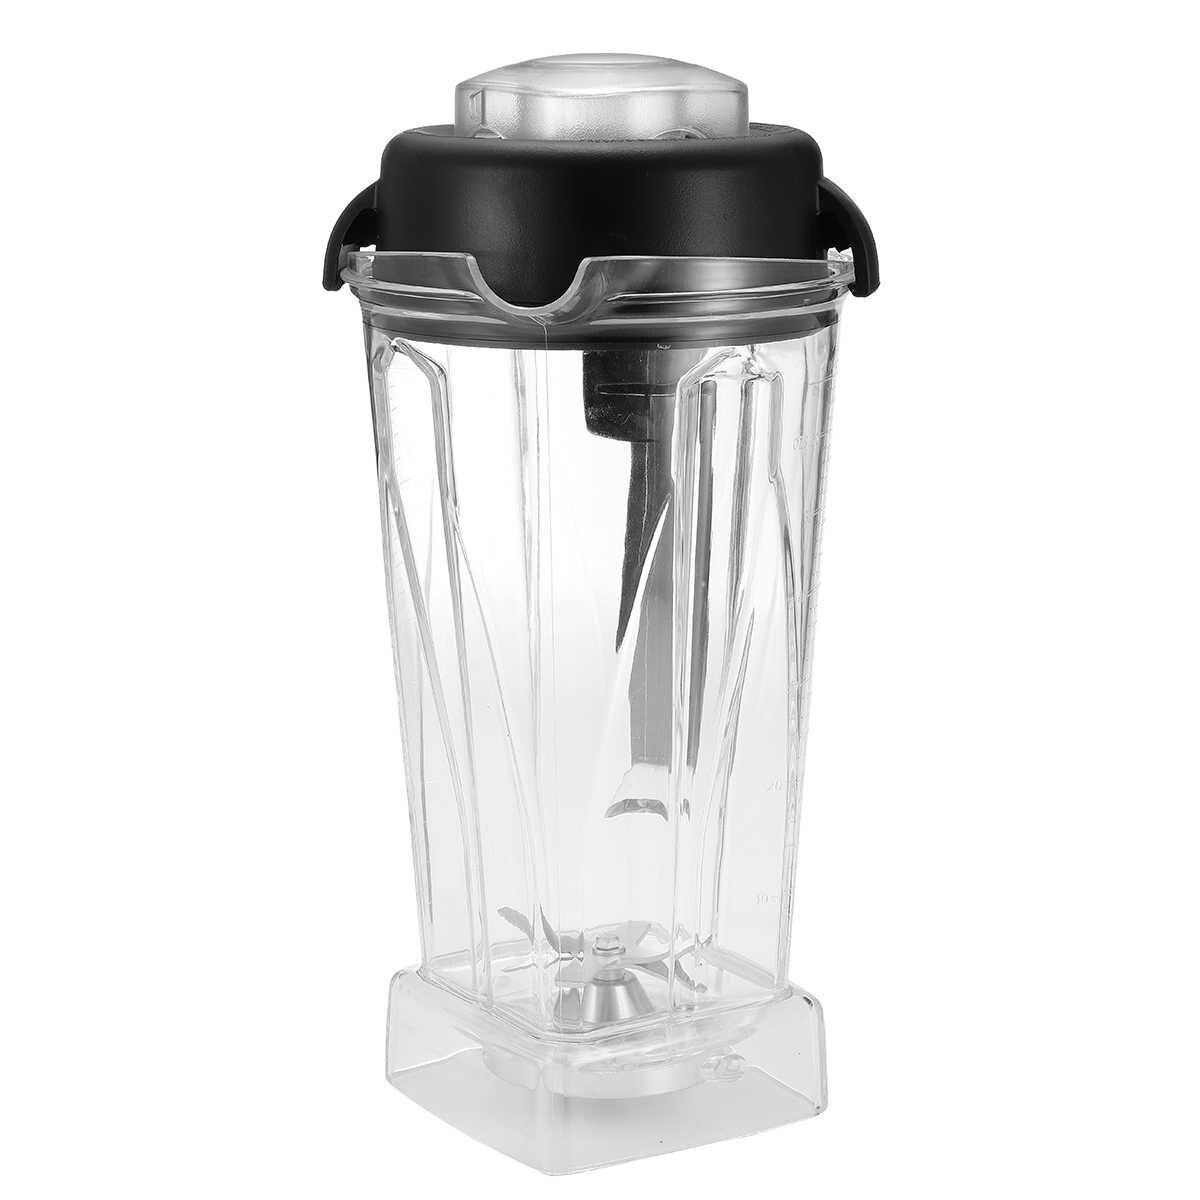 2L Recipiente Jarra Jarro Jarro De Copo Liquidificador Comercial/Peças De Reposição Para O Vitamix 60 oz Durável Home Kitchen Appliance Food parte Mixer